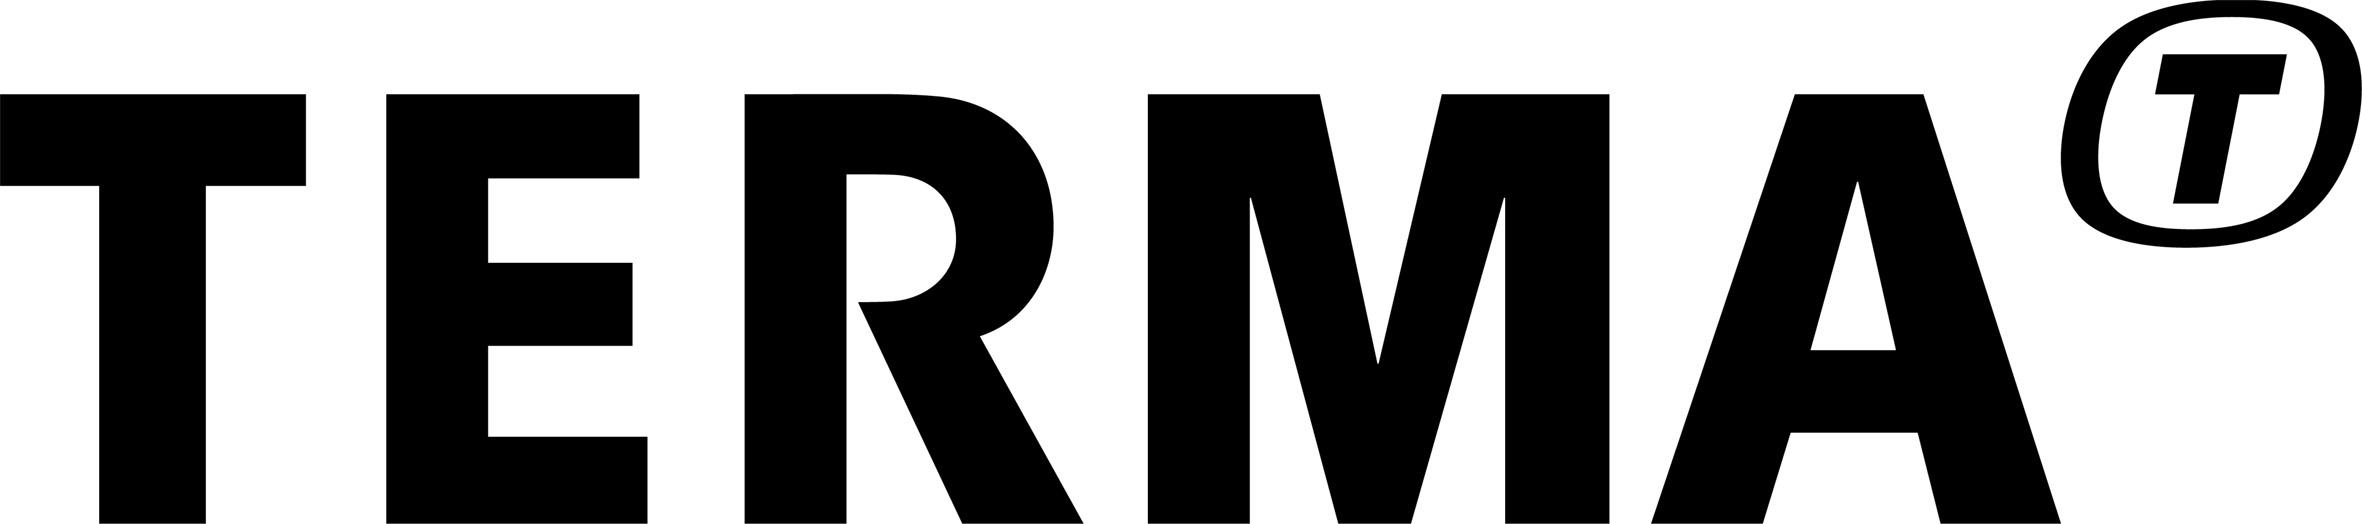 Terma Logo - Priess Steel